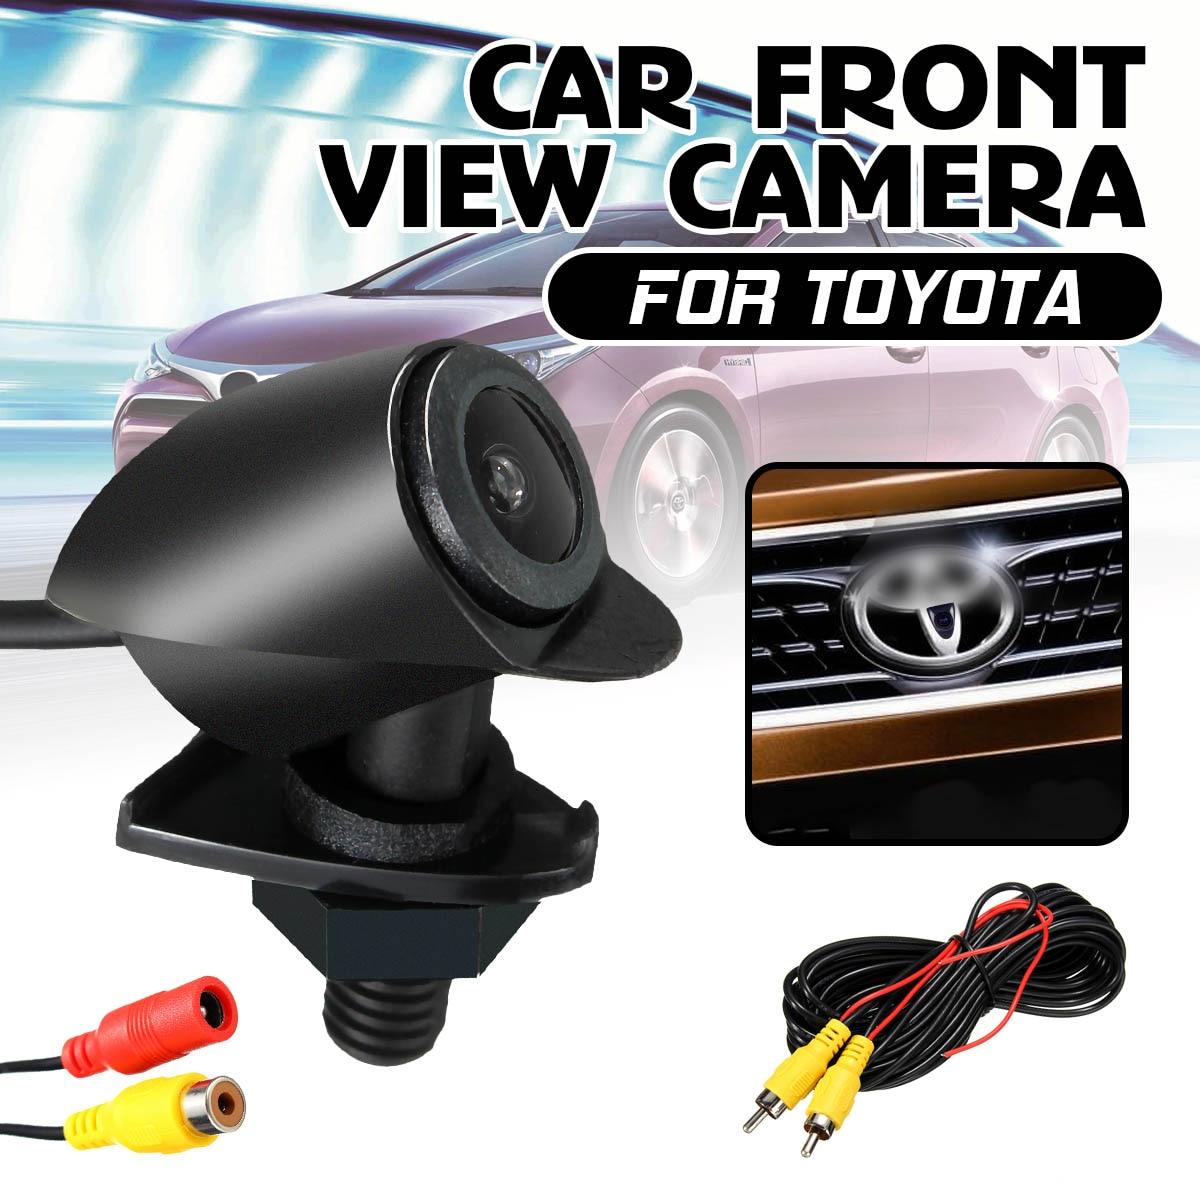 CCD Car Front View Camera Parking Waterproof Wide Angle Logo Embedded For Toyota Prado Highlander Land Camry Verso EZ RAV4 Cruis